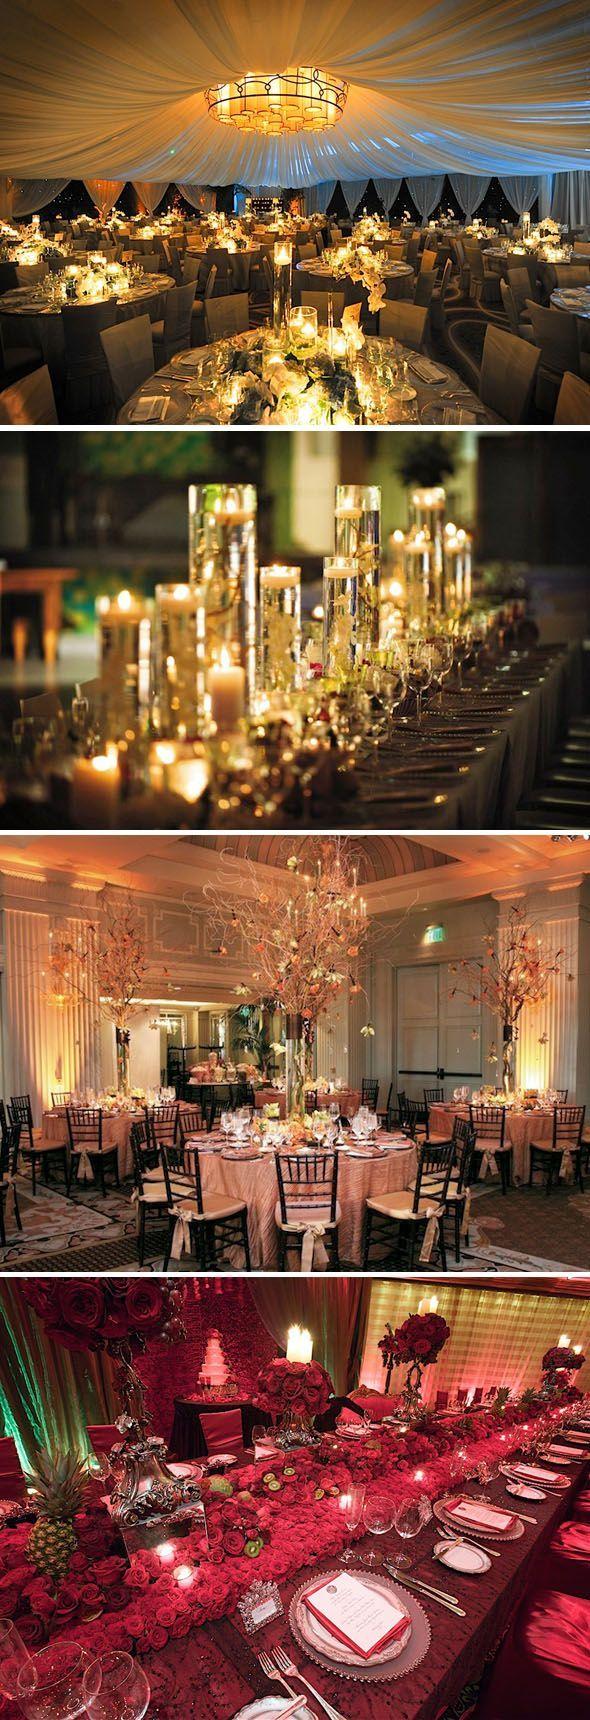 Salones para bodas muy lujosos para inspirarte bodas and for Decoracion salones